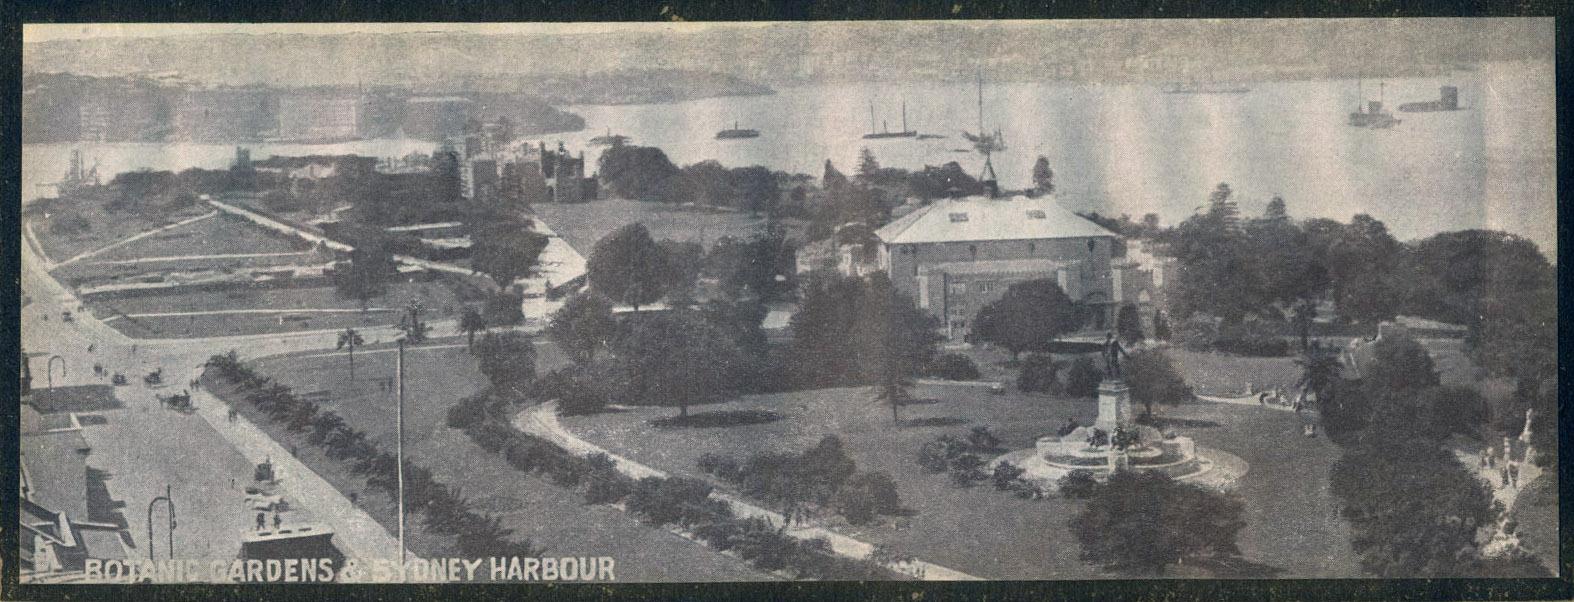 Botanical Gardens & Sydney Harbour